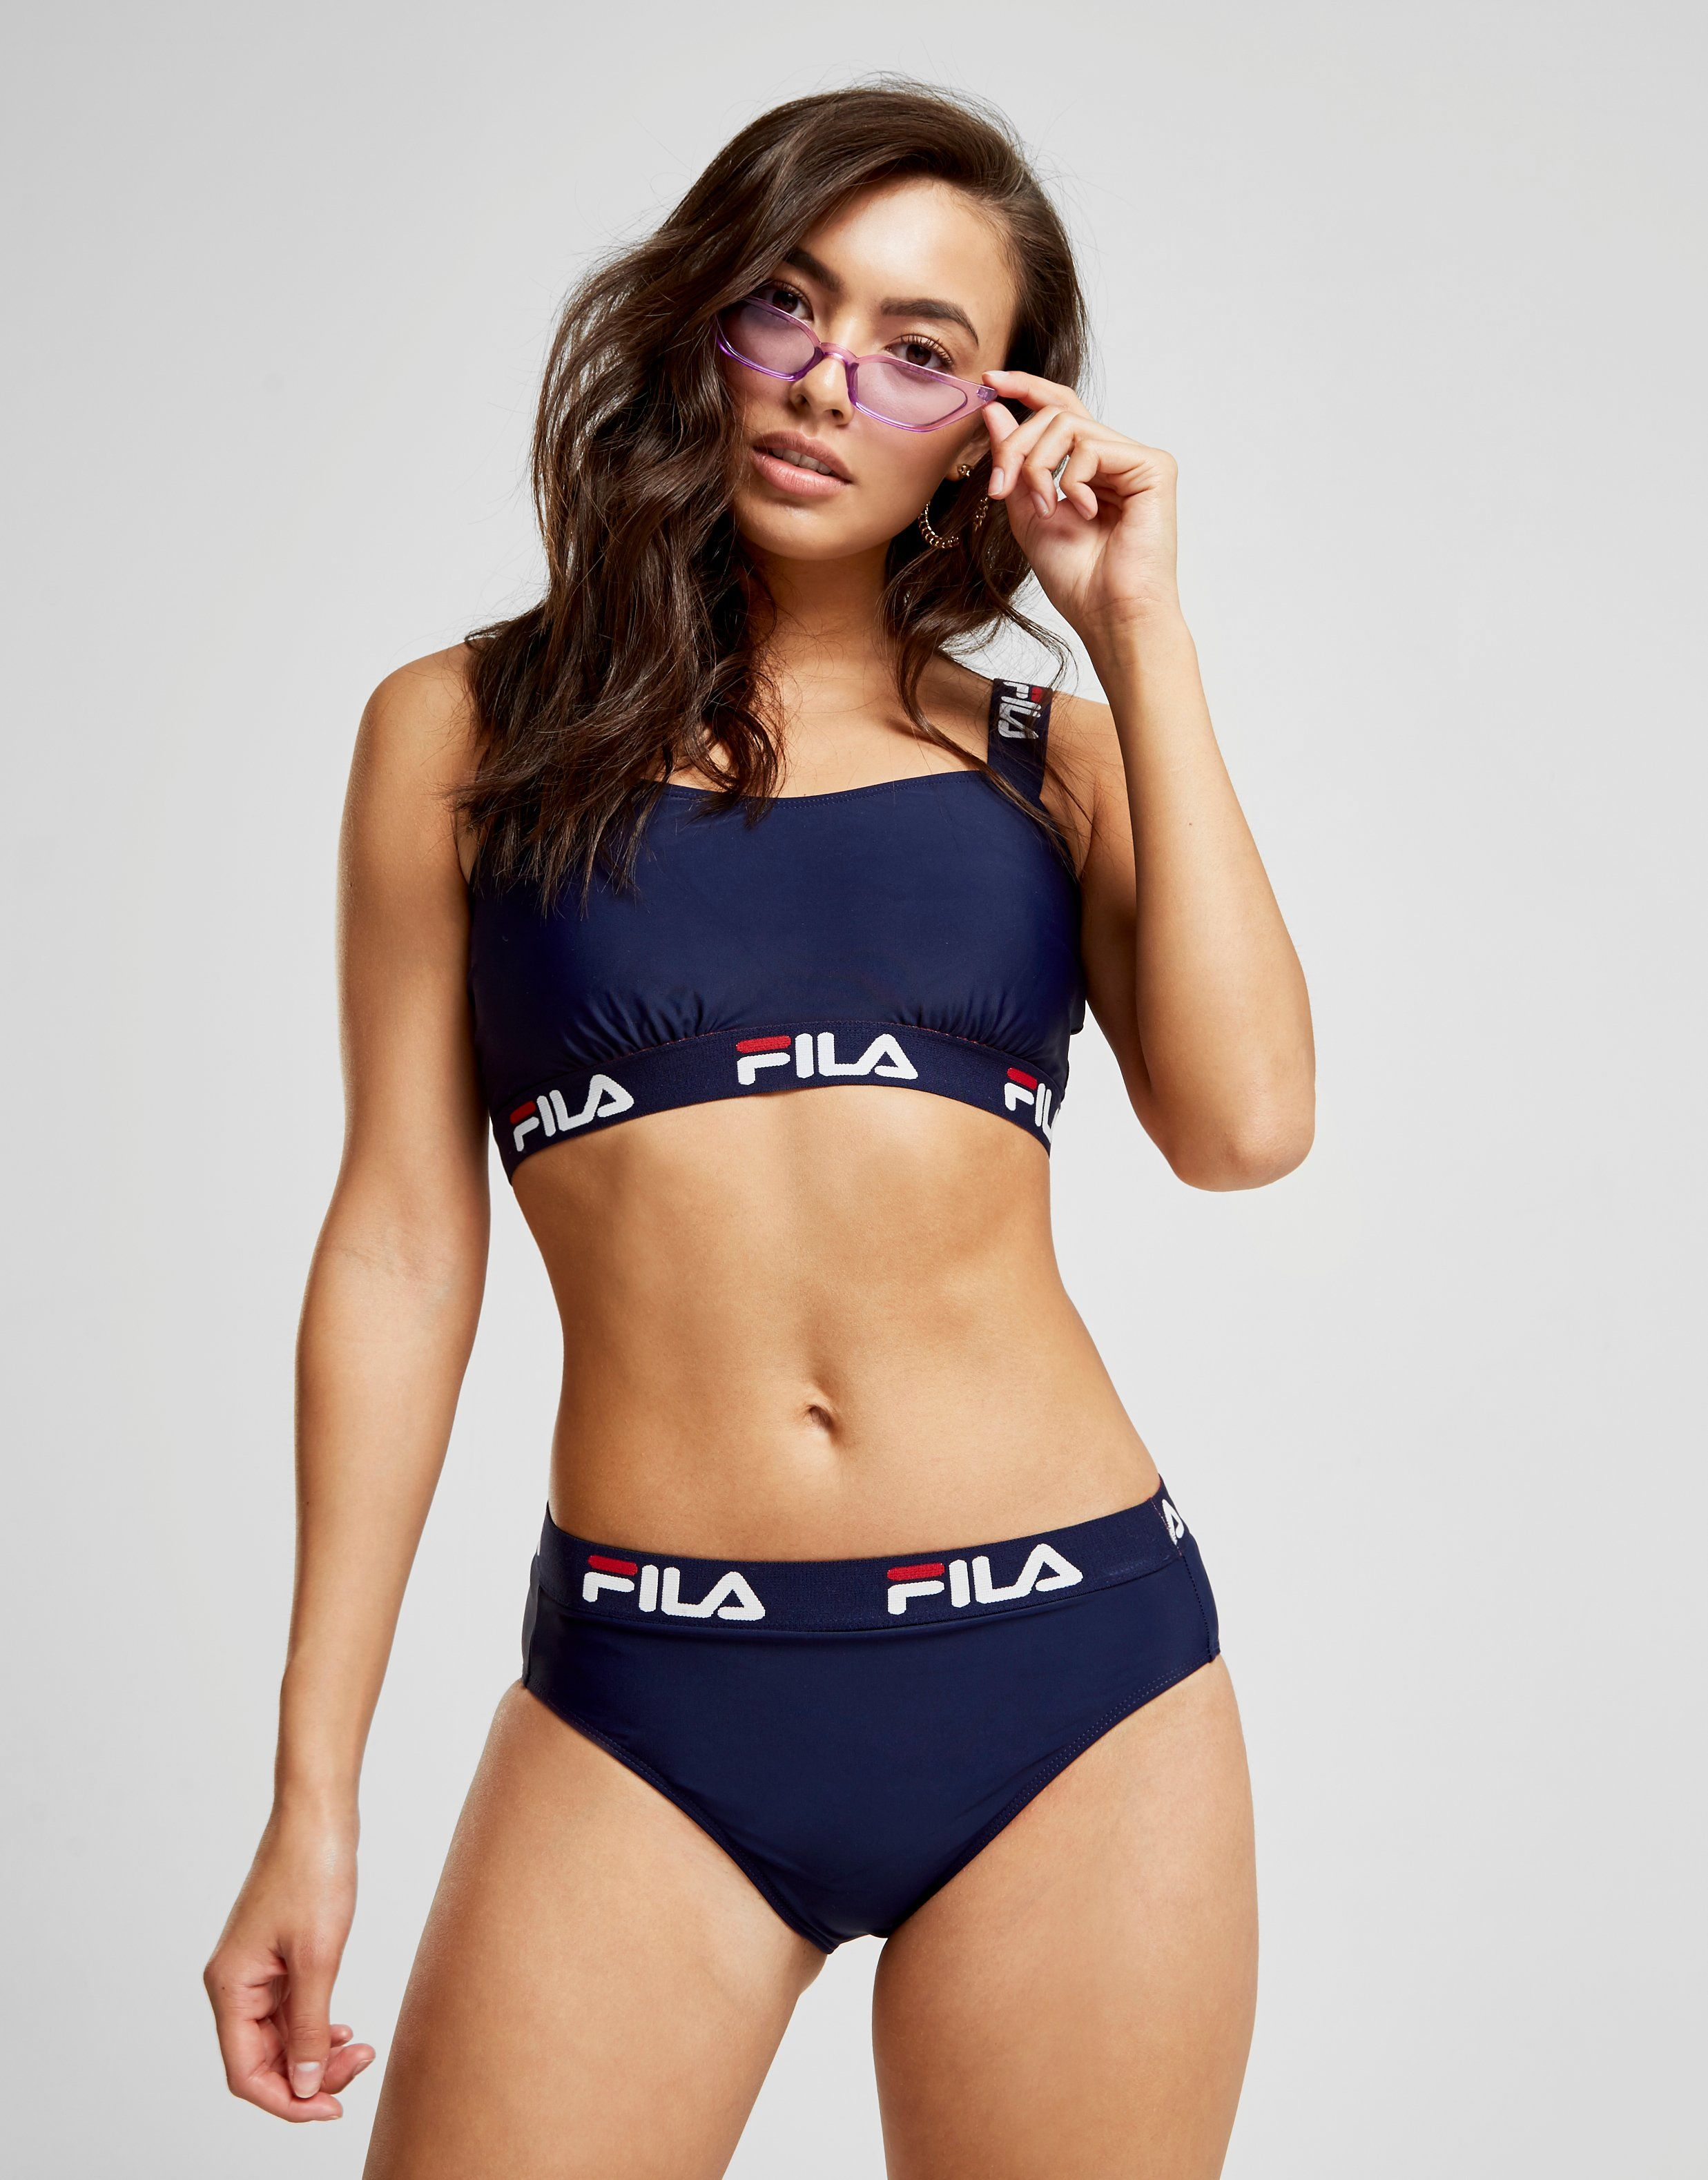 fila bas de maillot de bain tape bikini femme jd sports. Black Bedroom Furniture Sets. Home Design Ideas